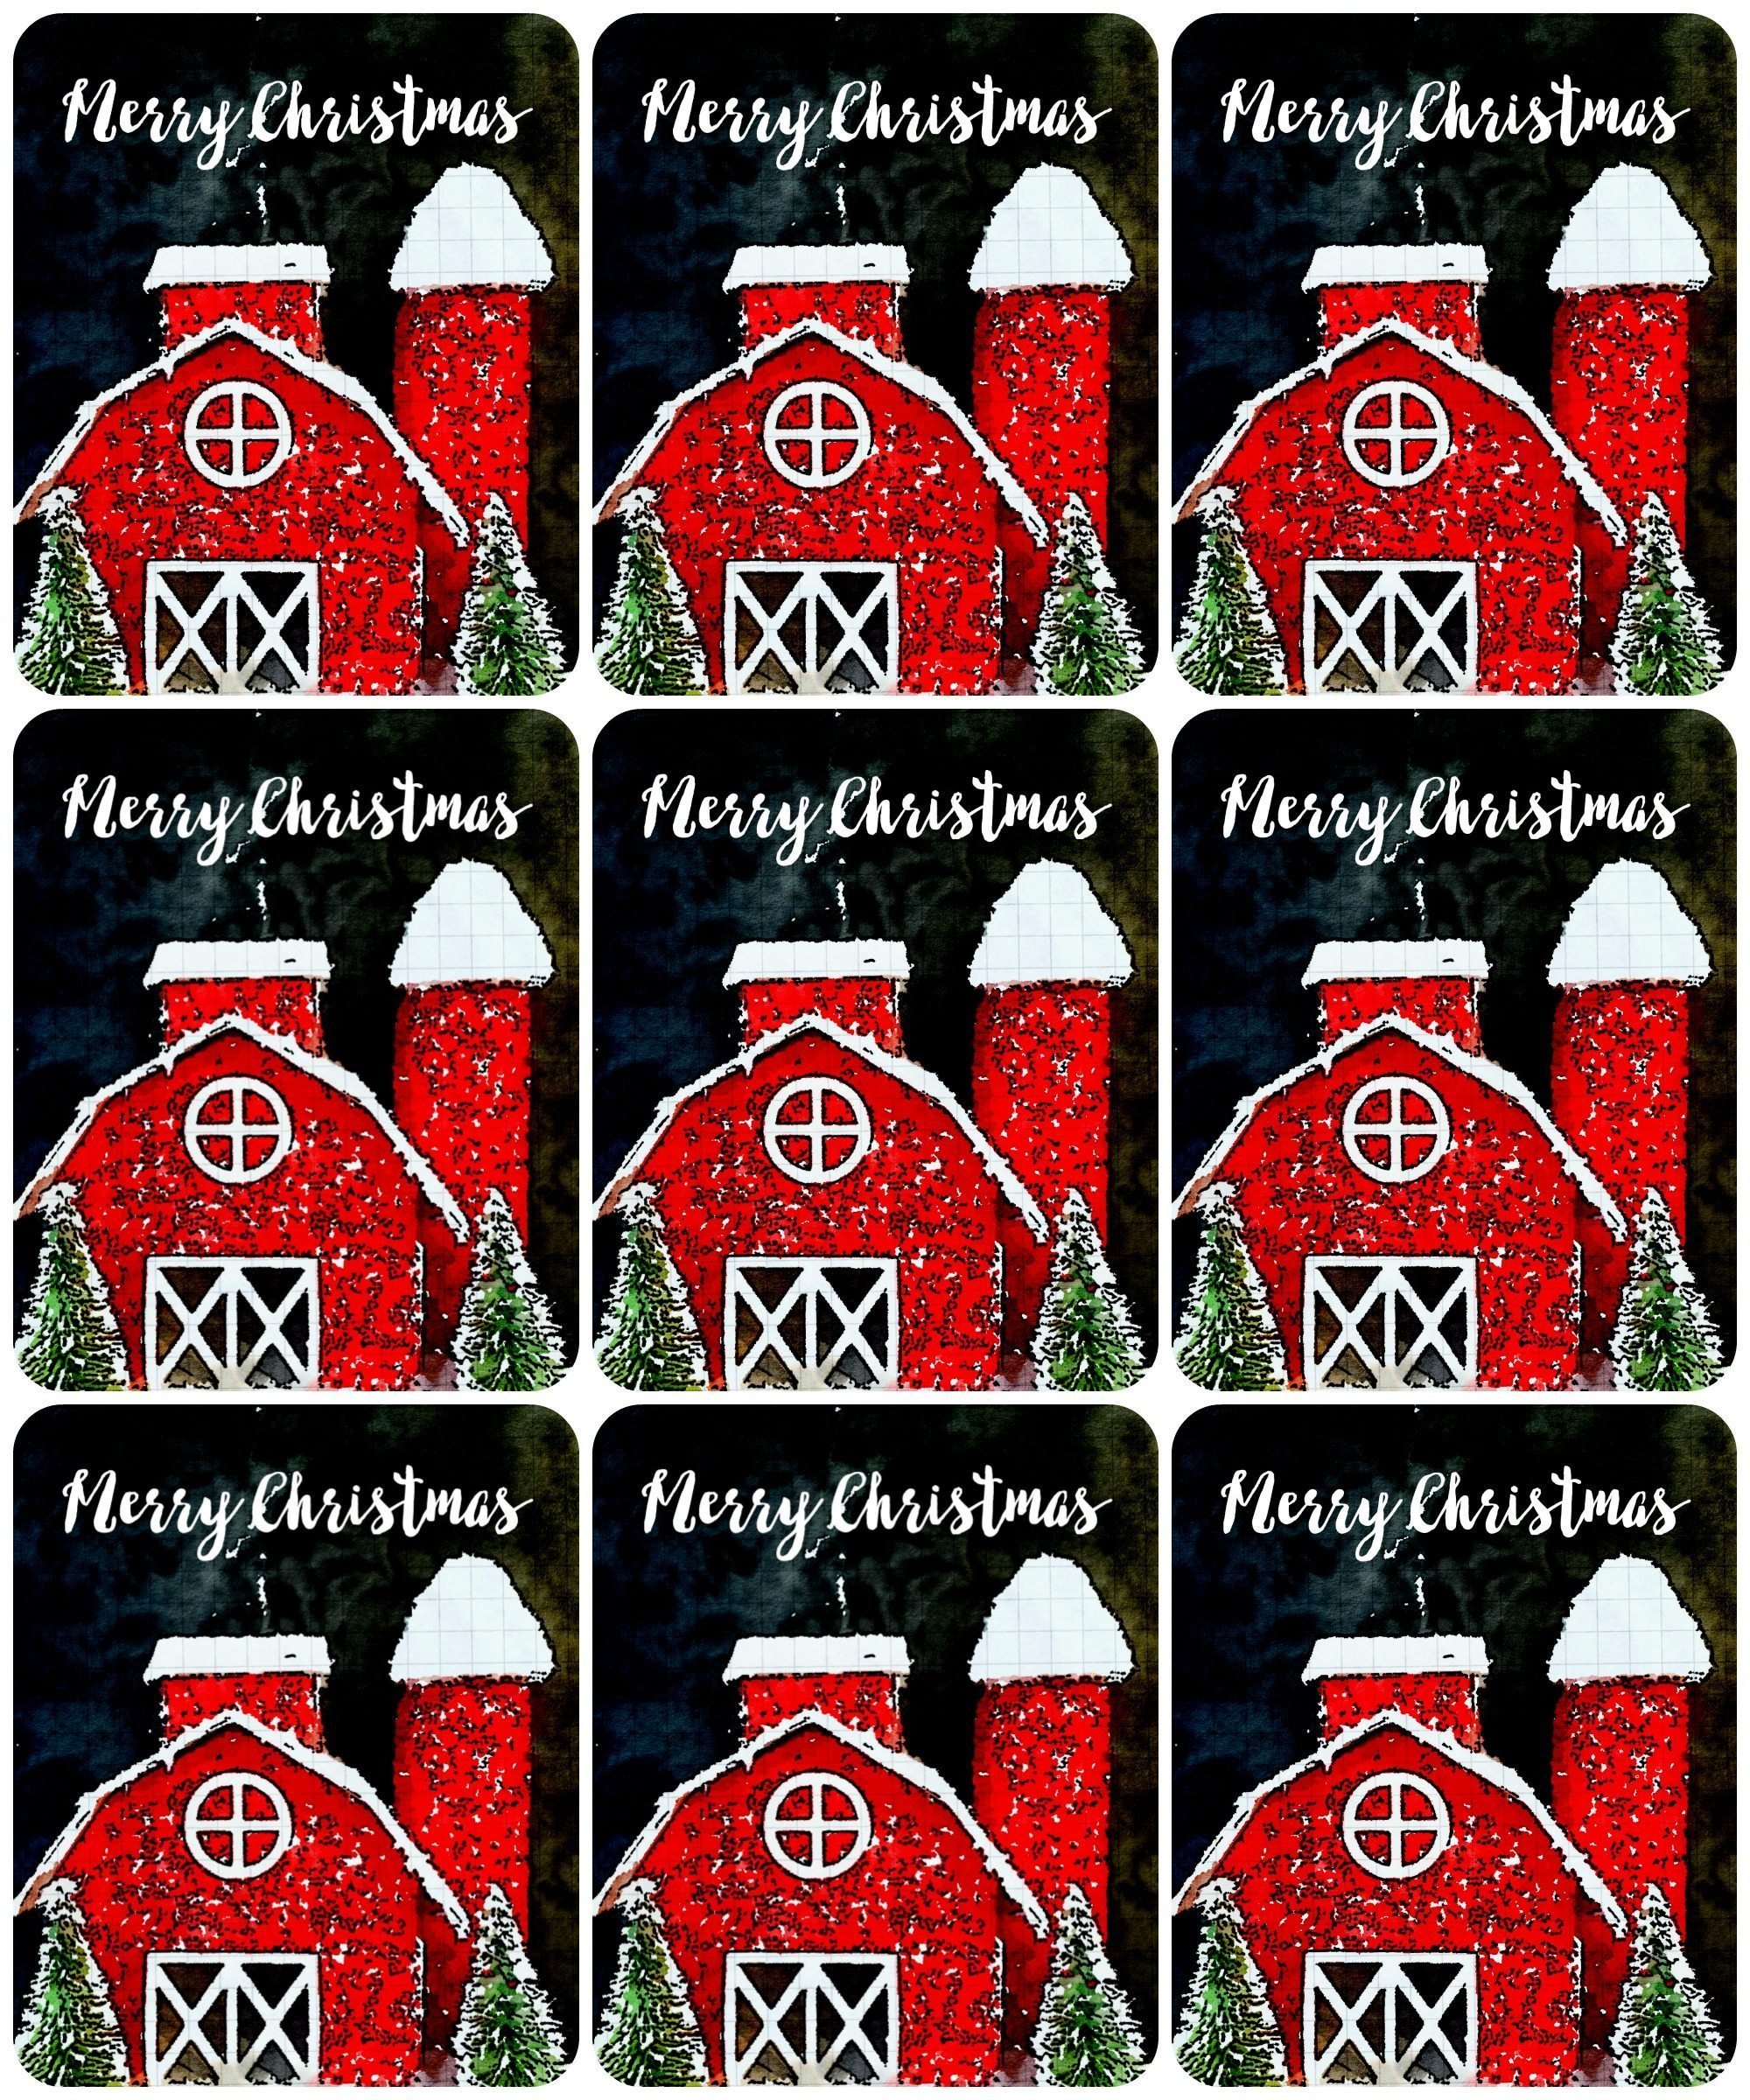 merry-christmas-red-barn-gift-tags